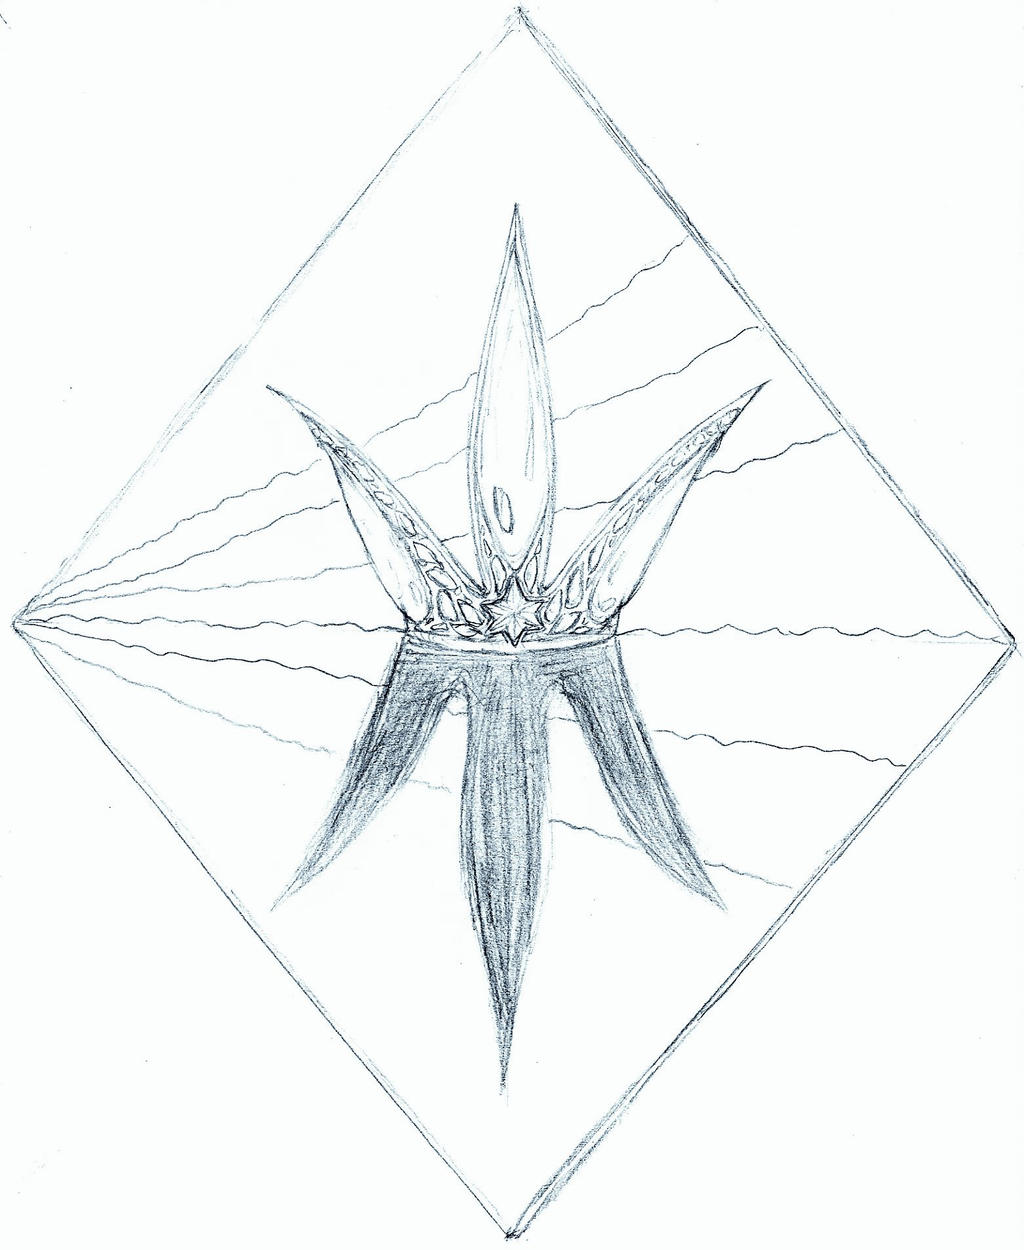 Wappen by sunnight1